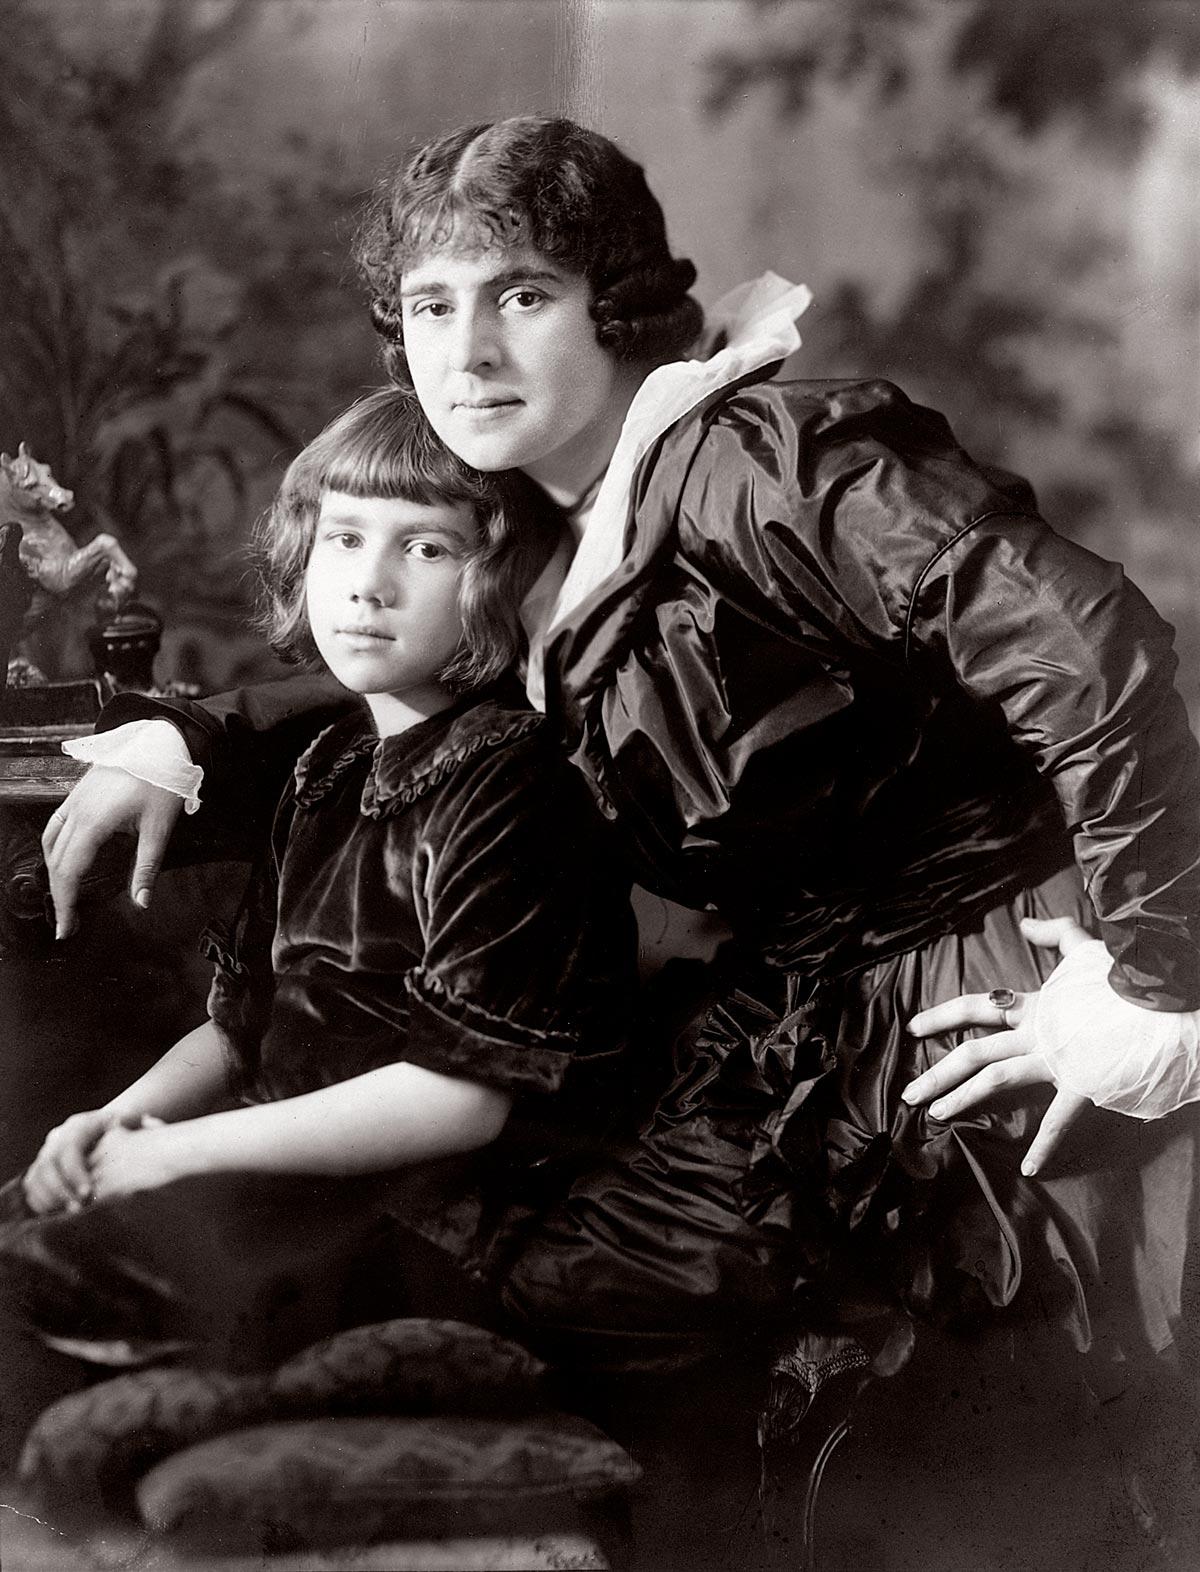 Th.St. mit Moiby (Mopsa), Foto Franz Grainer, ca. 1913